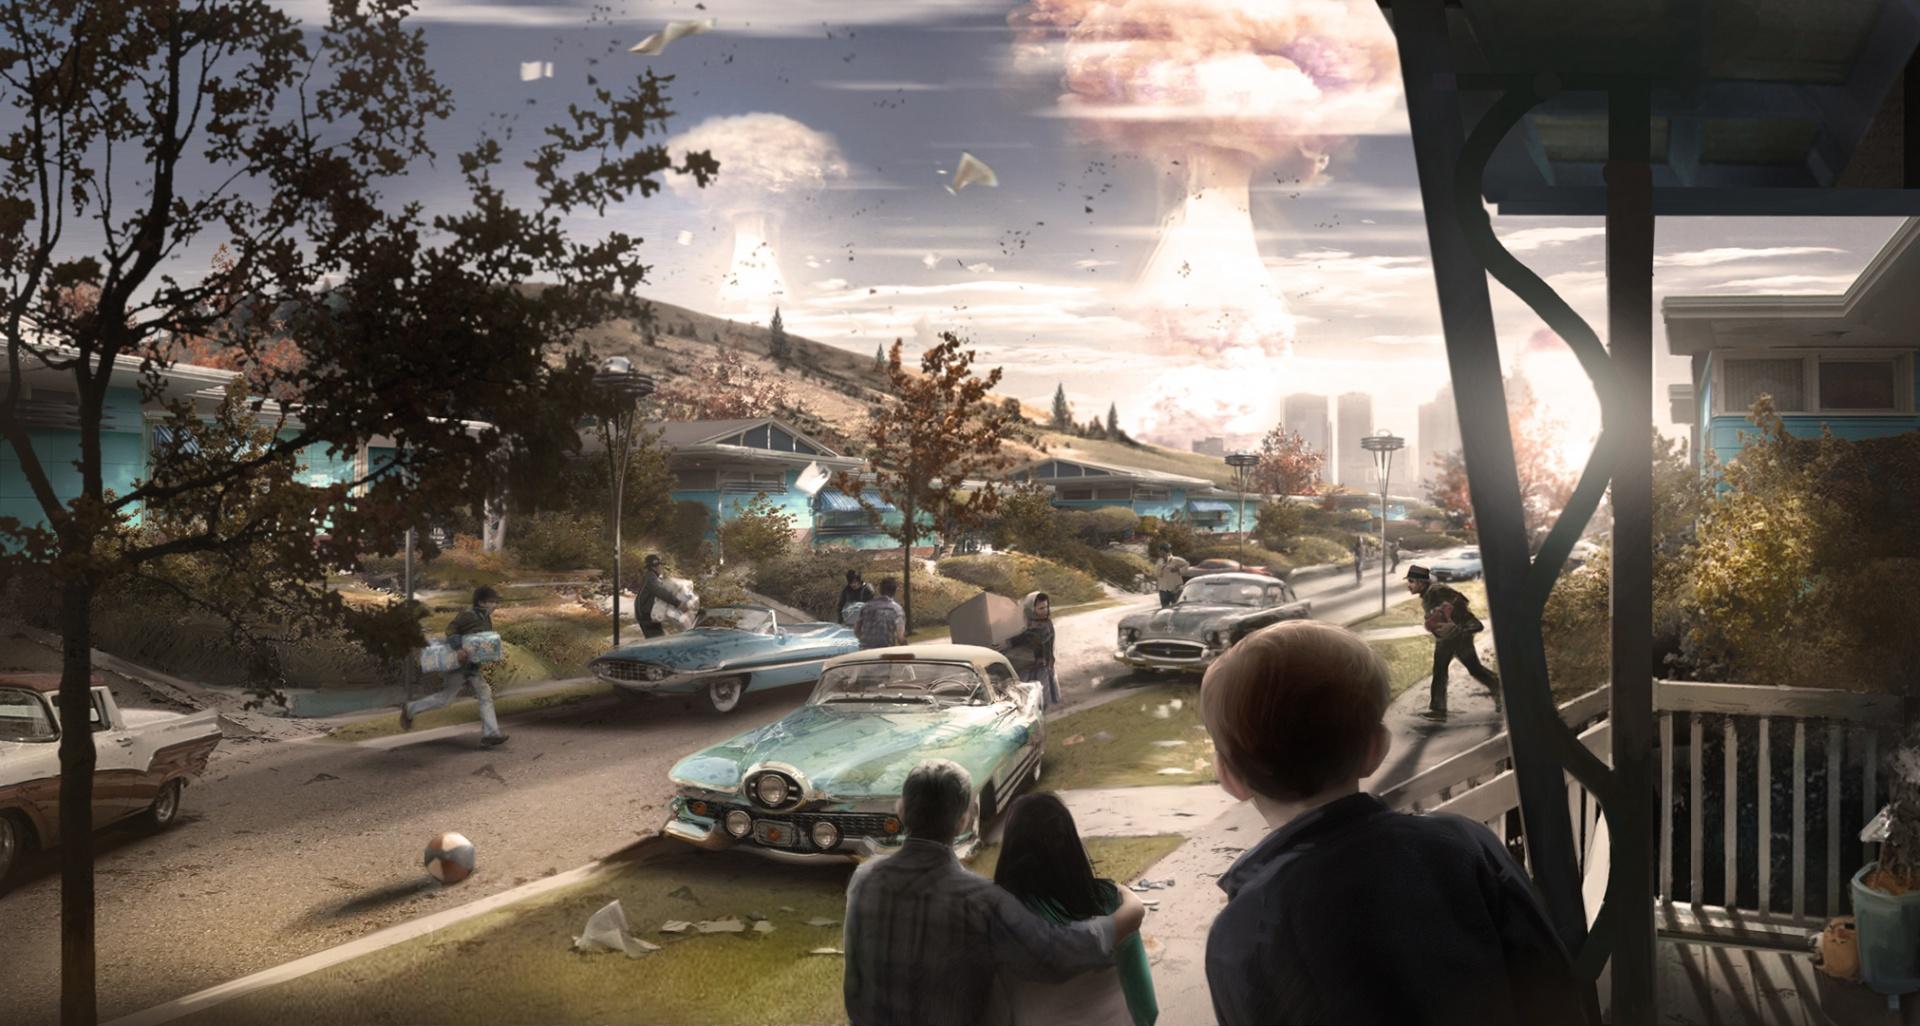 Chute des bombes